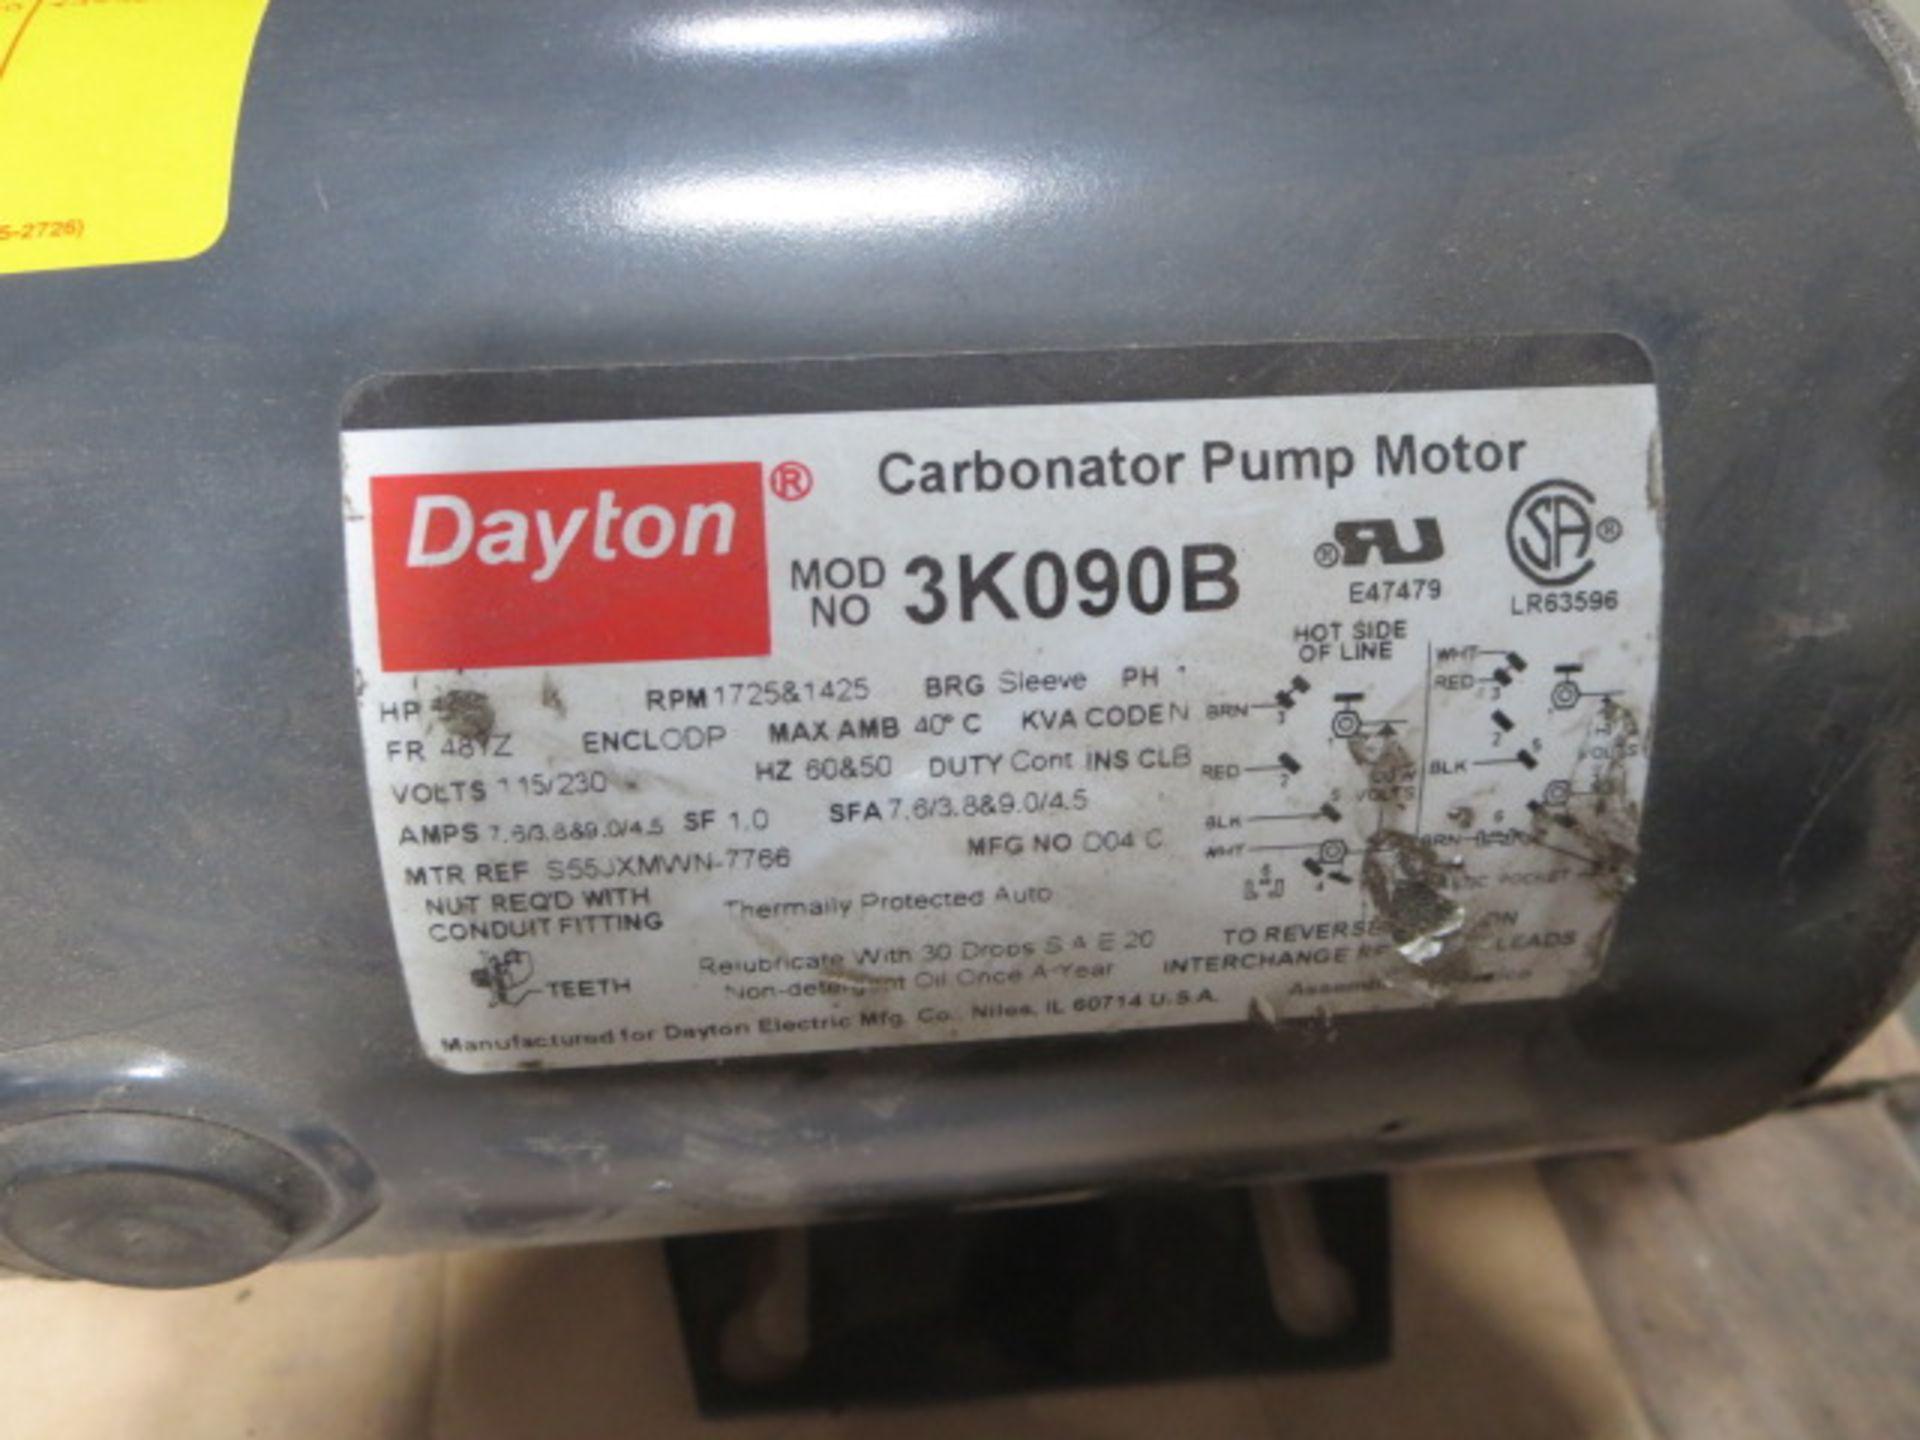 Lot 244 - Dayton Carbonator Pump Motor, Single Phase, 60Hz